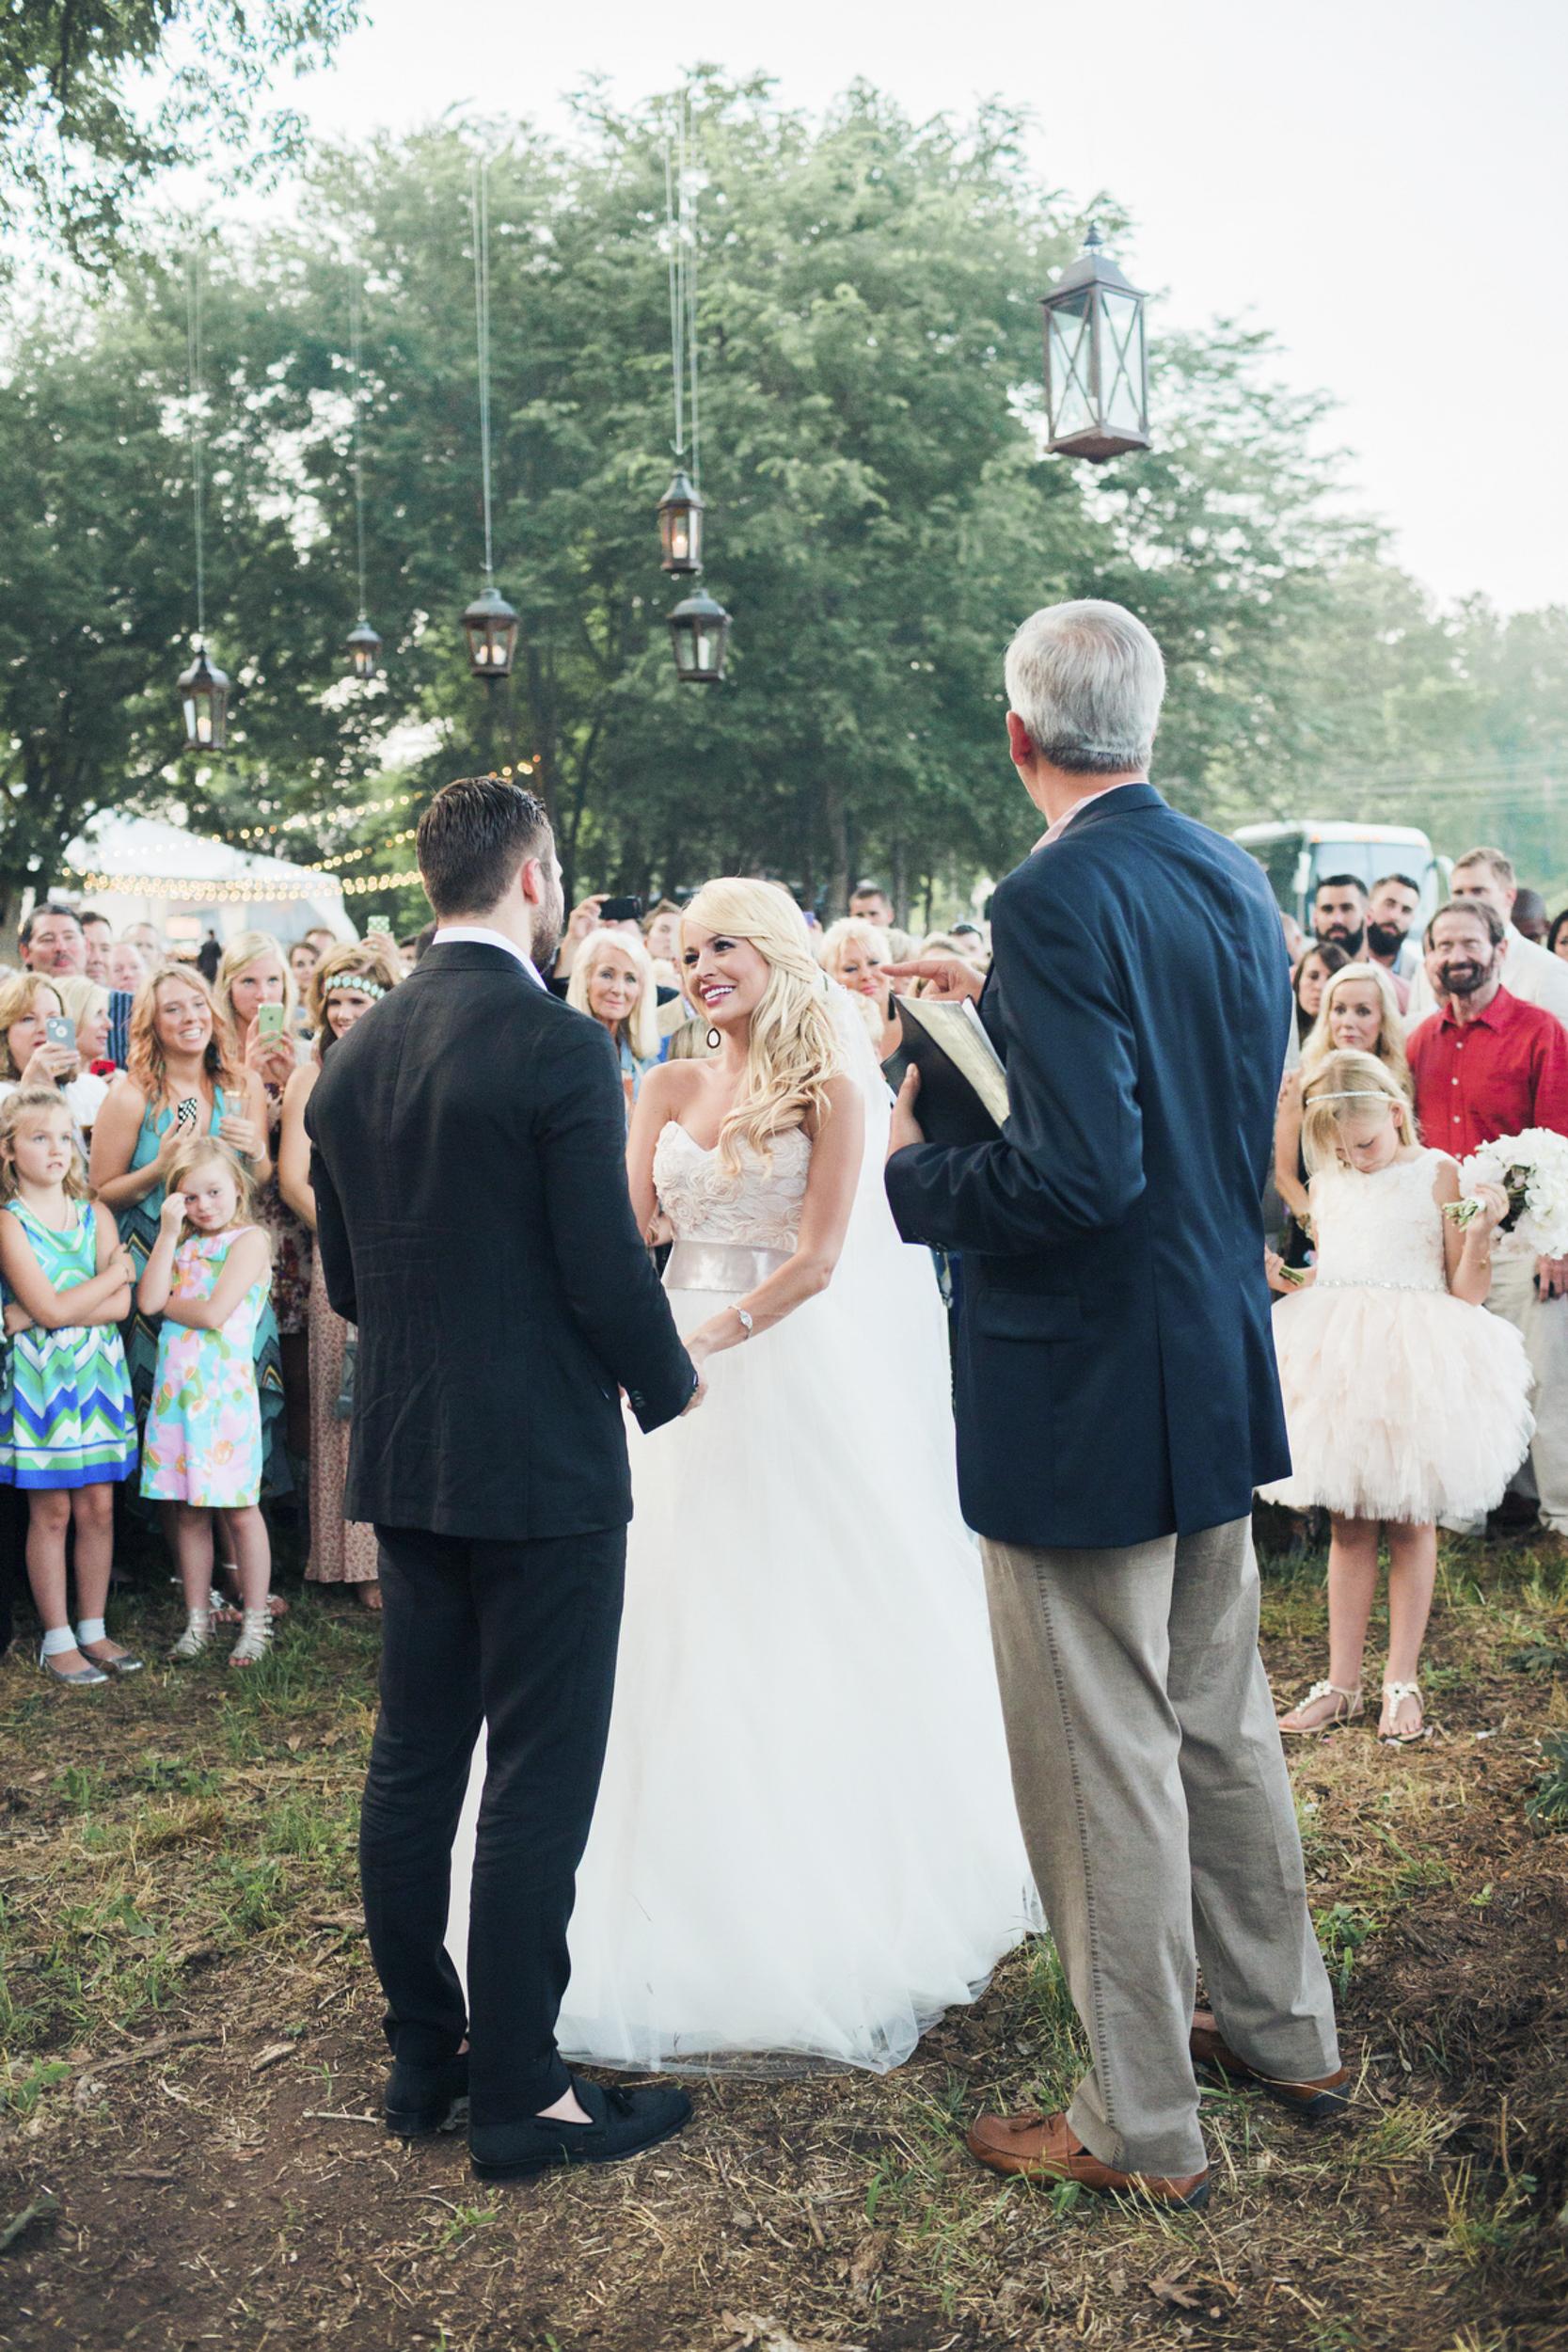 south_carolina_farm_wedding_rustic_chic_surprise_secret_luxe_wedding_bachelorette_emily_maynard_real_weddings-35.jpg